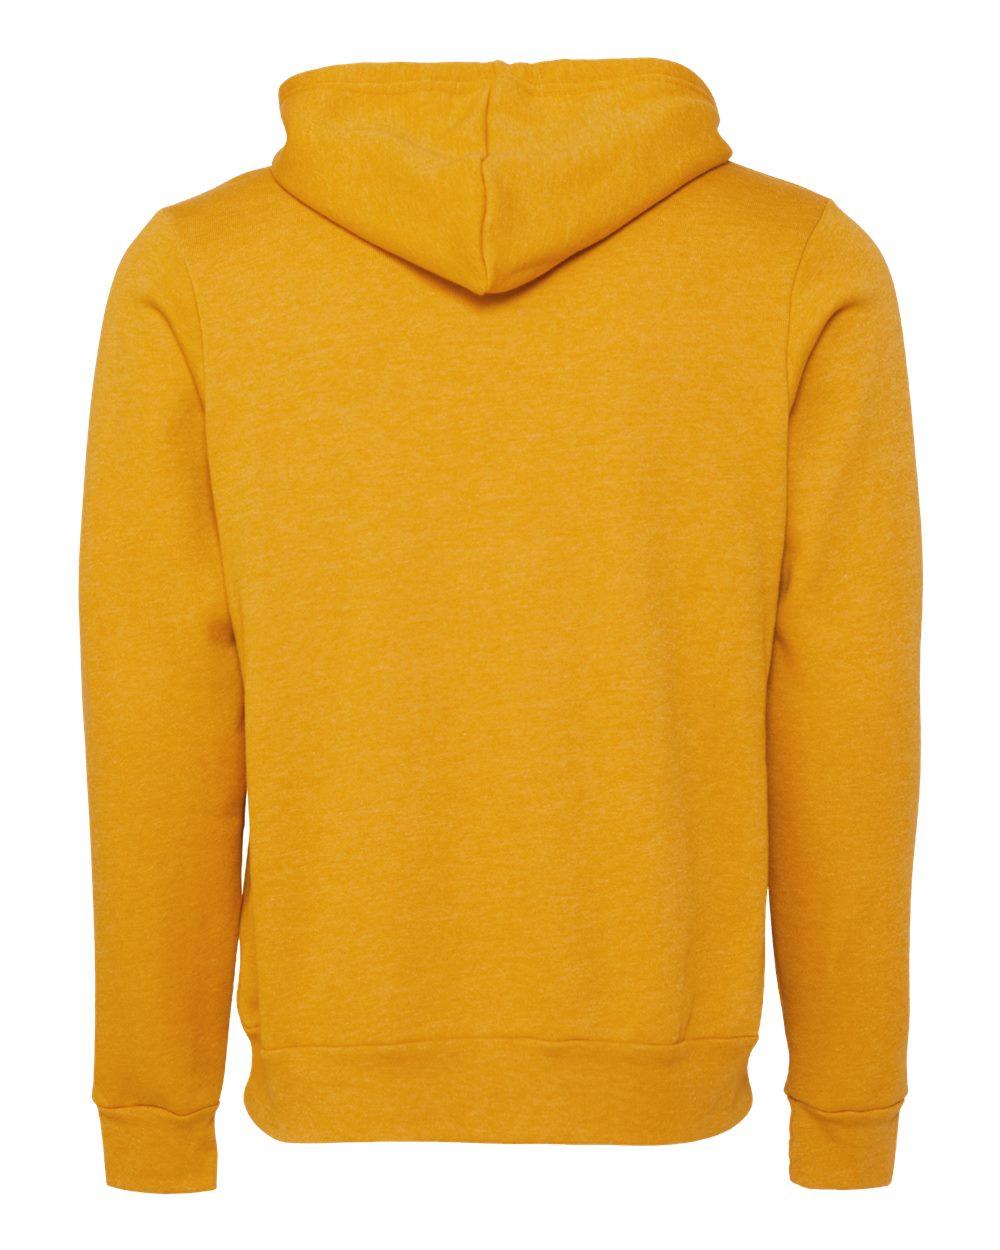 Bella-Canvas-Unisex-Sponge-Hooded-Pullover-Sweatshirt-Blank-3719-up-to-2XL thumbnail 50